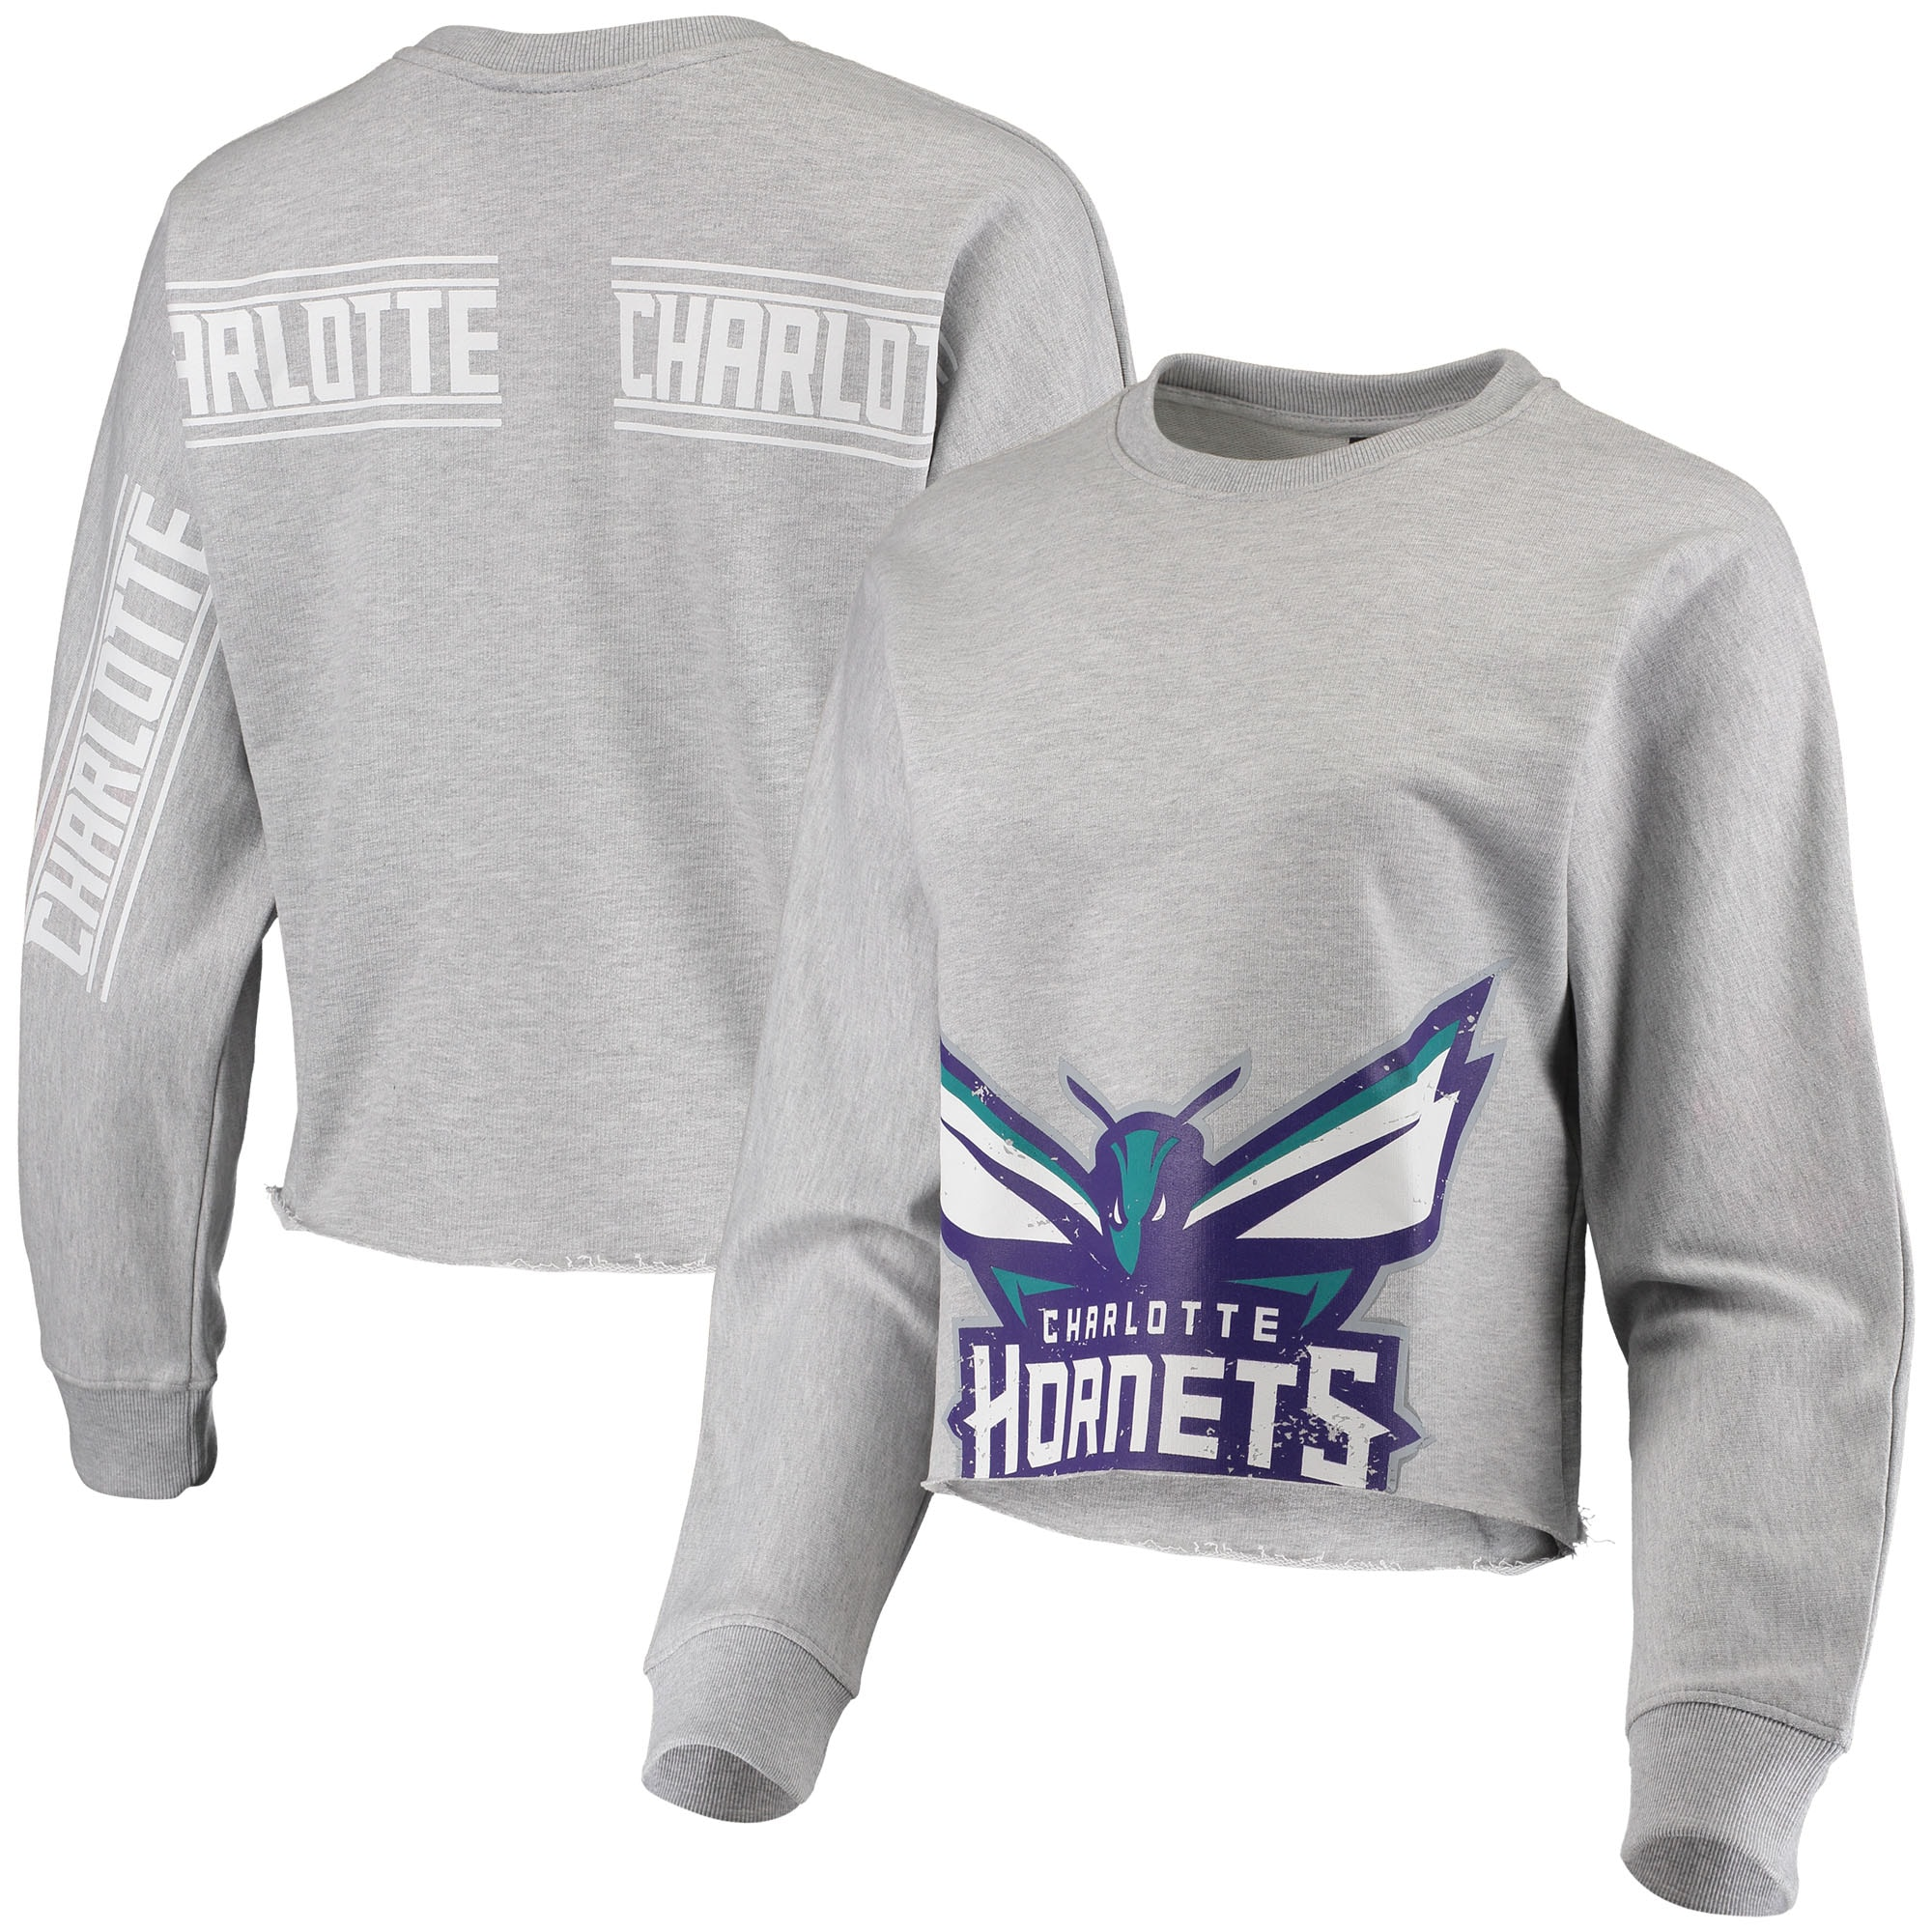 Charlotte Hornets Women's Cropped Long Sleeve T-Shirt - Gray